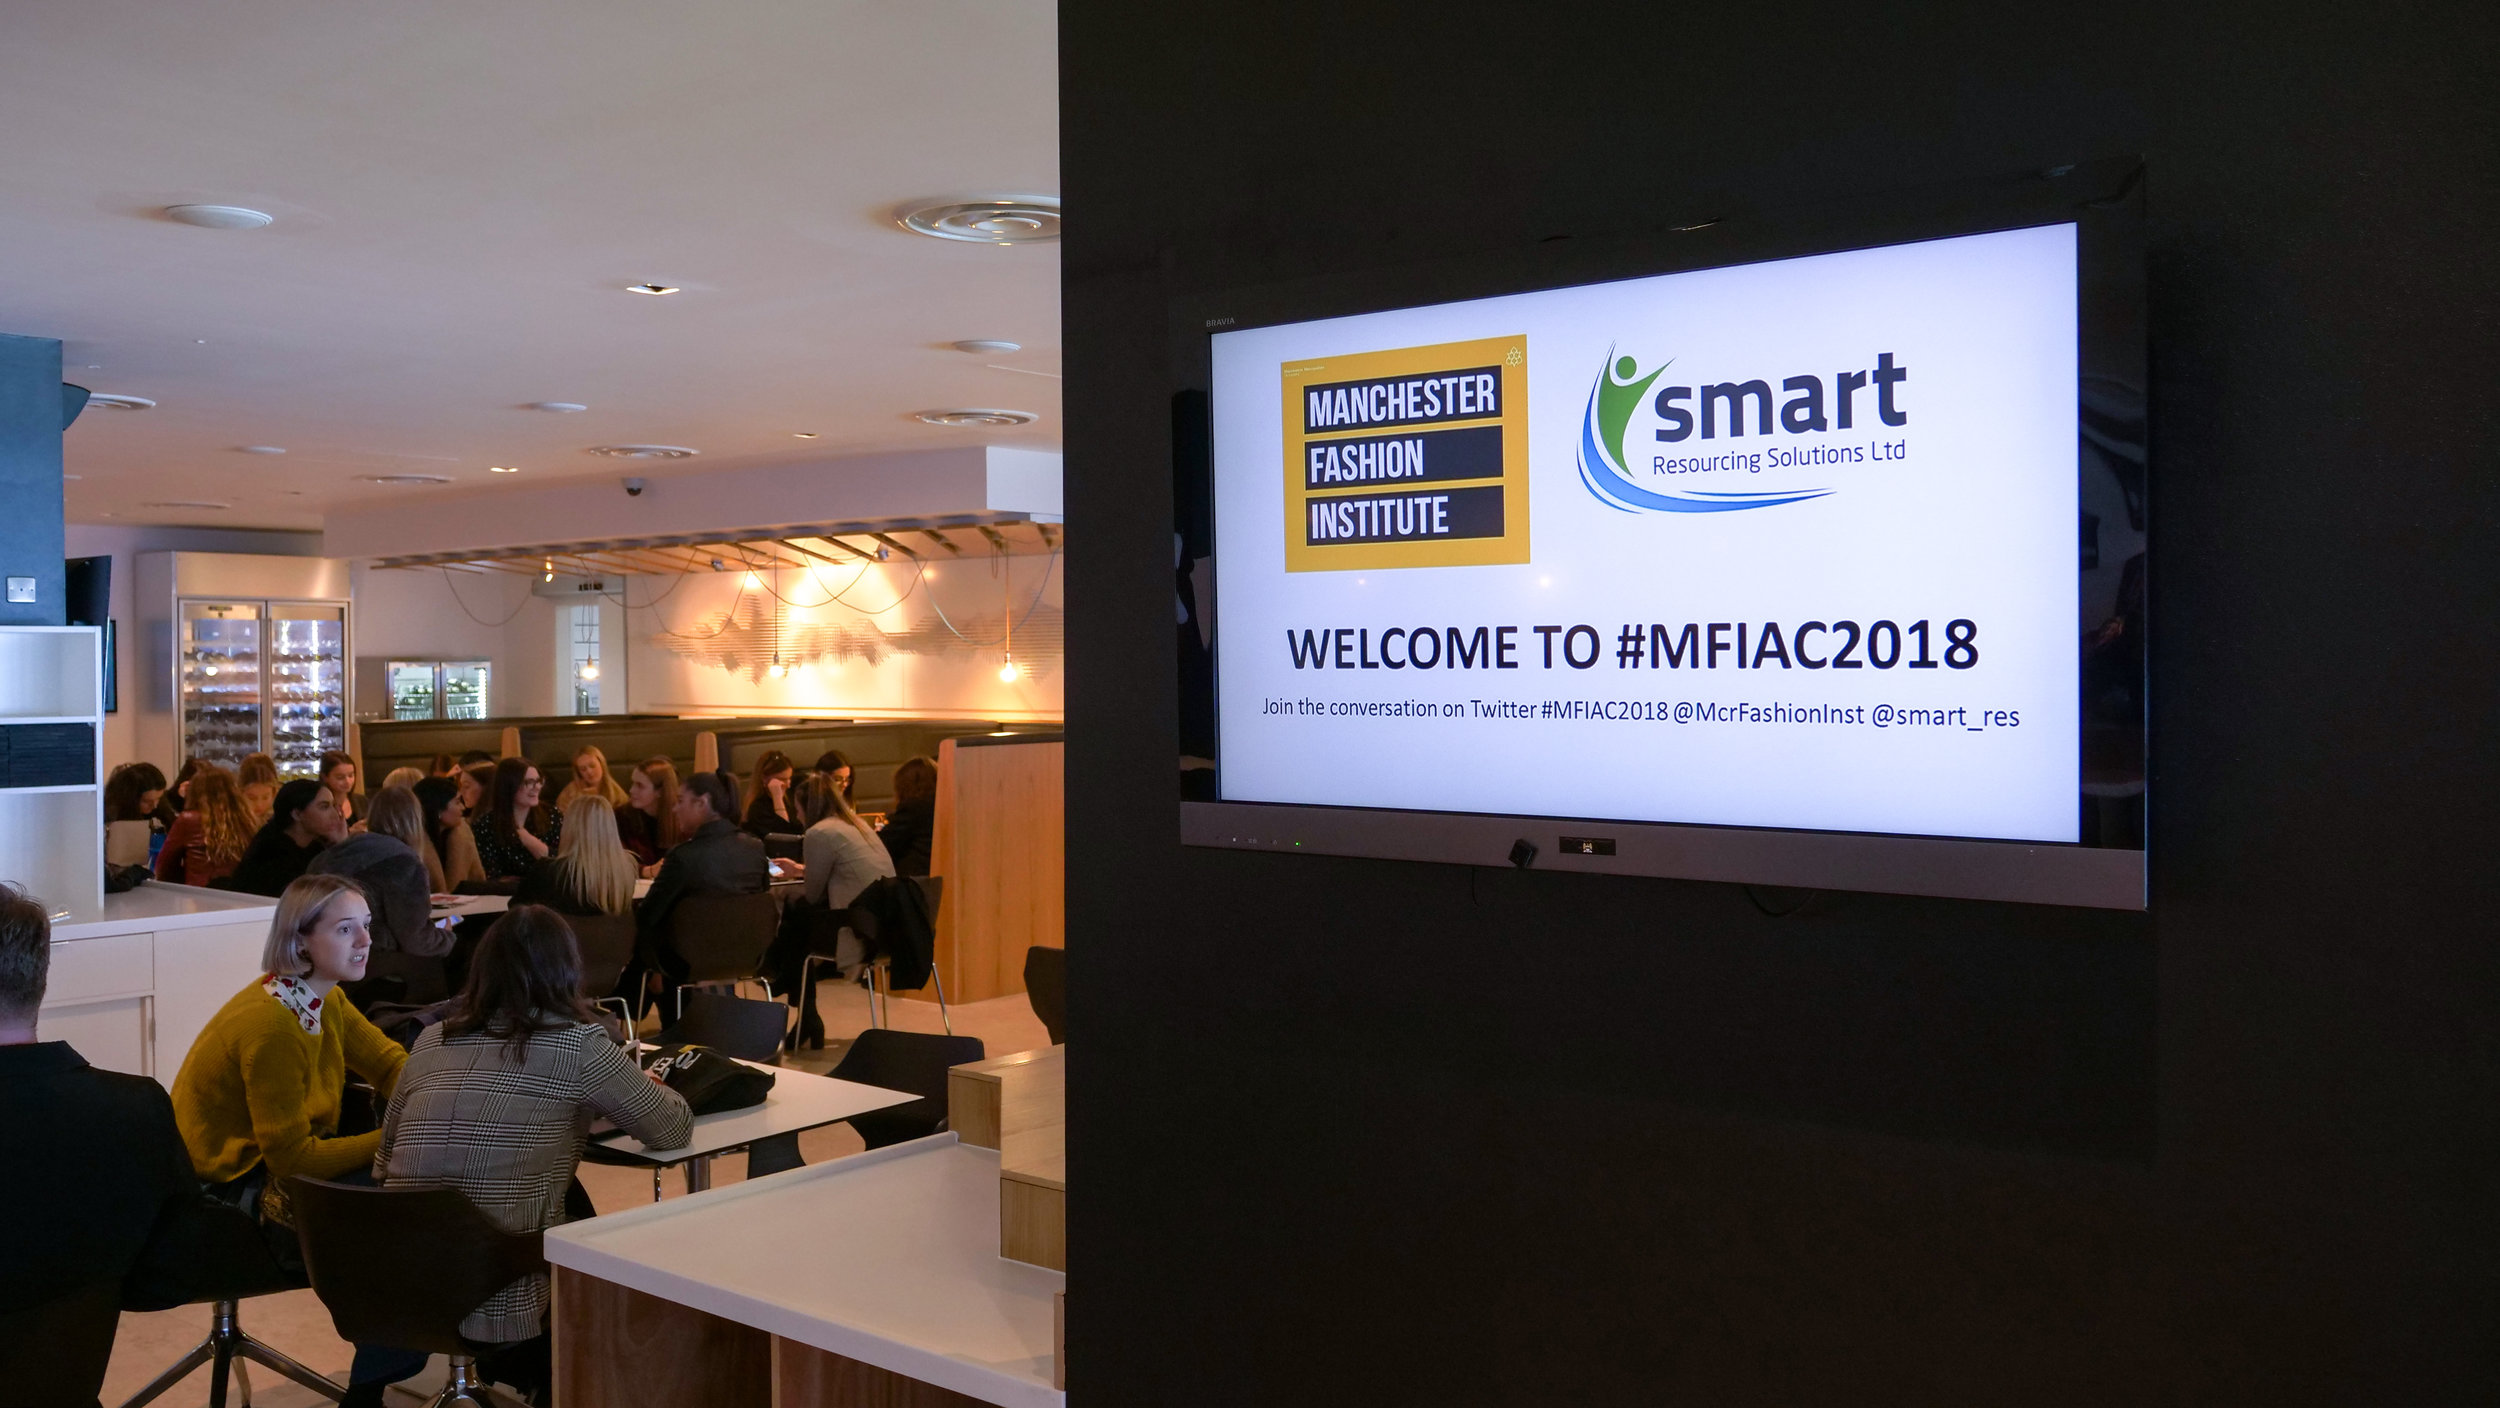 Smart Resourcing Solutions